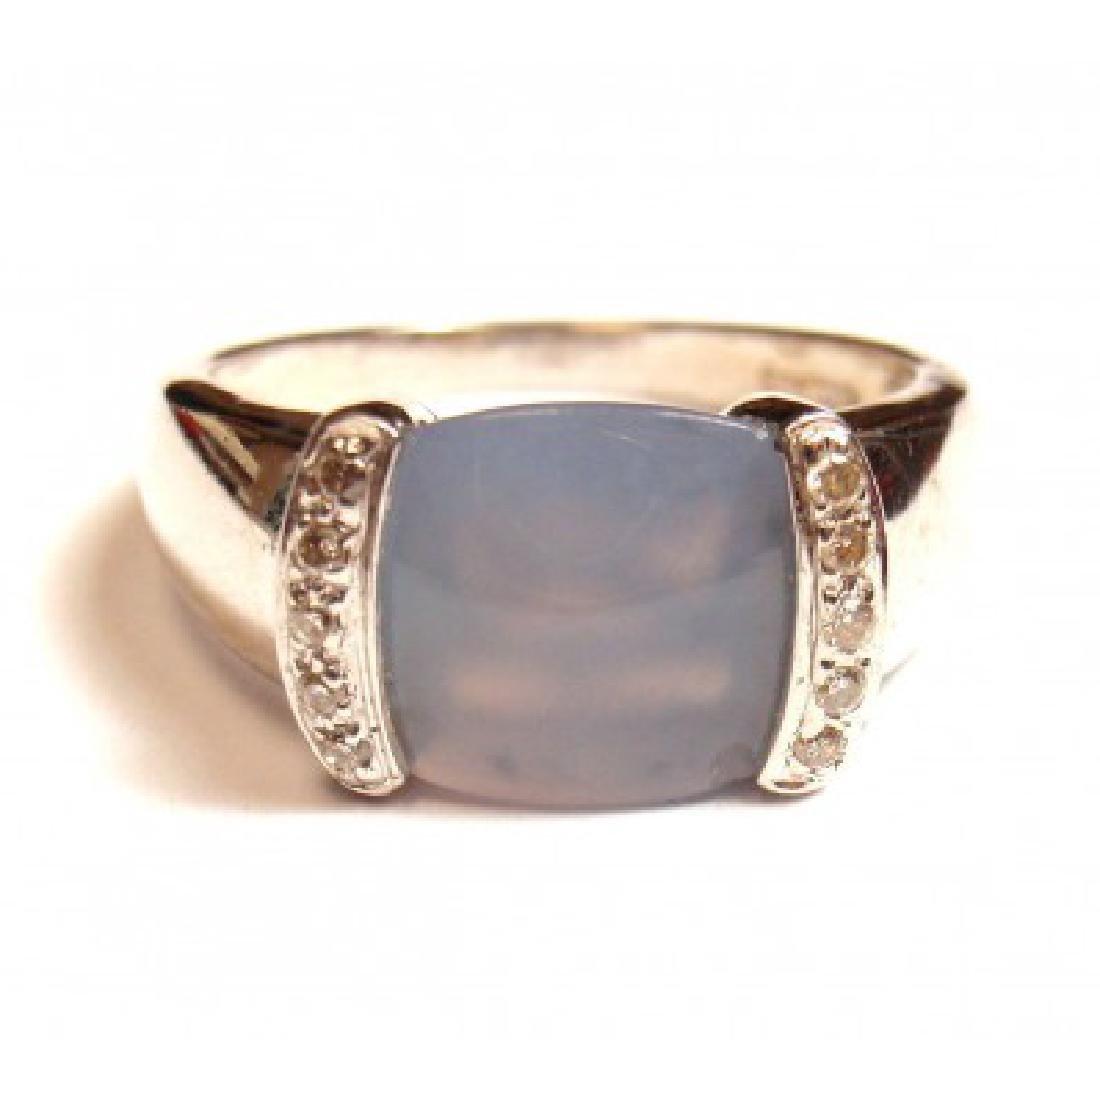 ESTATE 14K WHITE GOLD DIAMOND CHALCEDONY RING